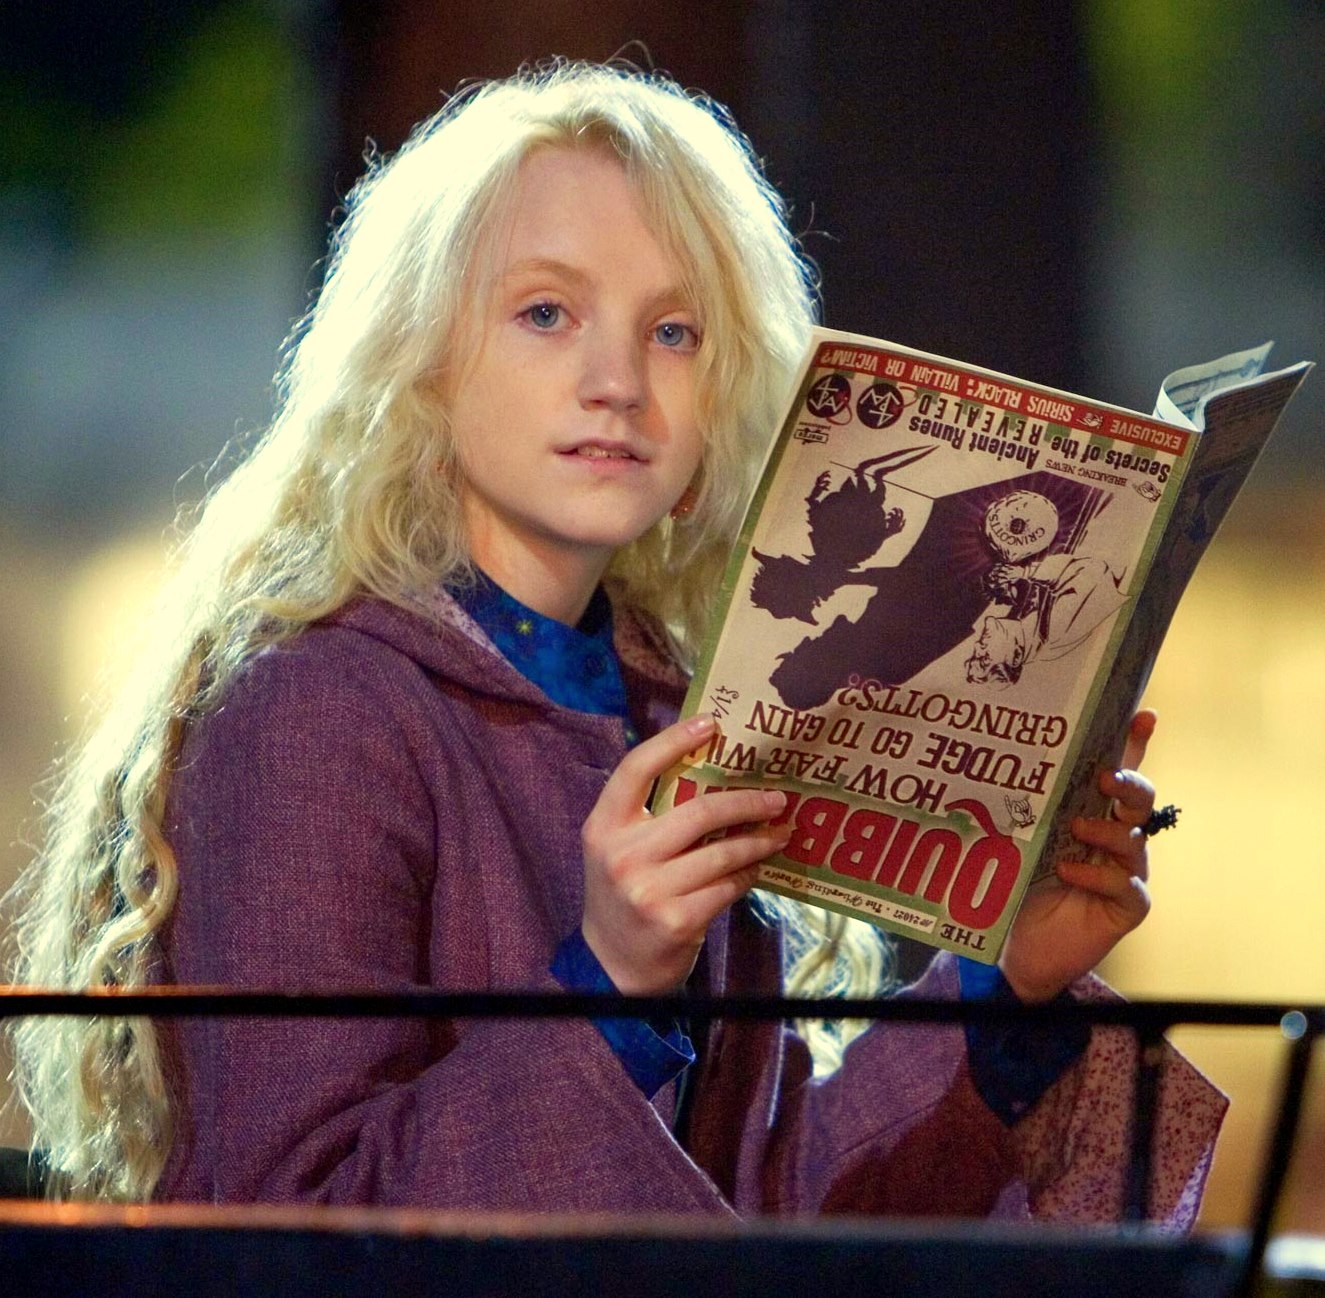 Hermione Granger Versus the Methods of Rationality (Feminist